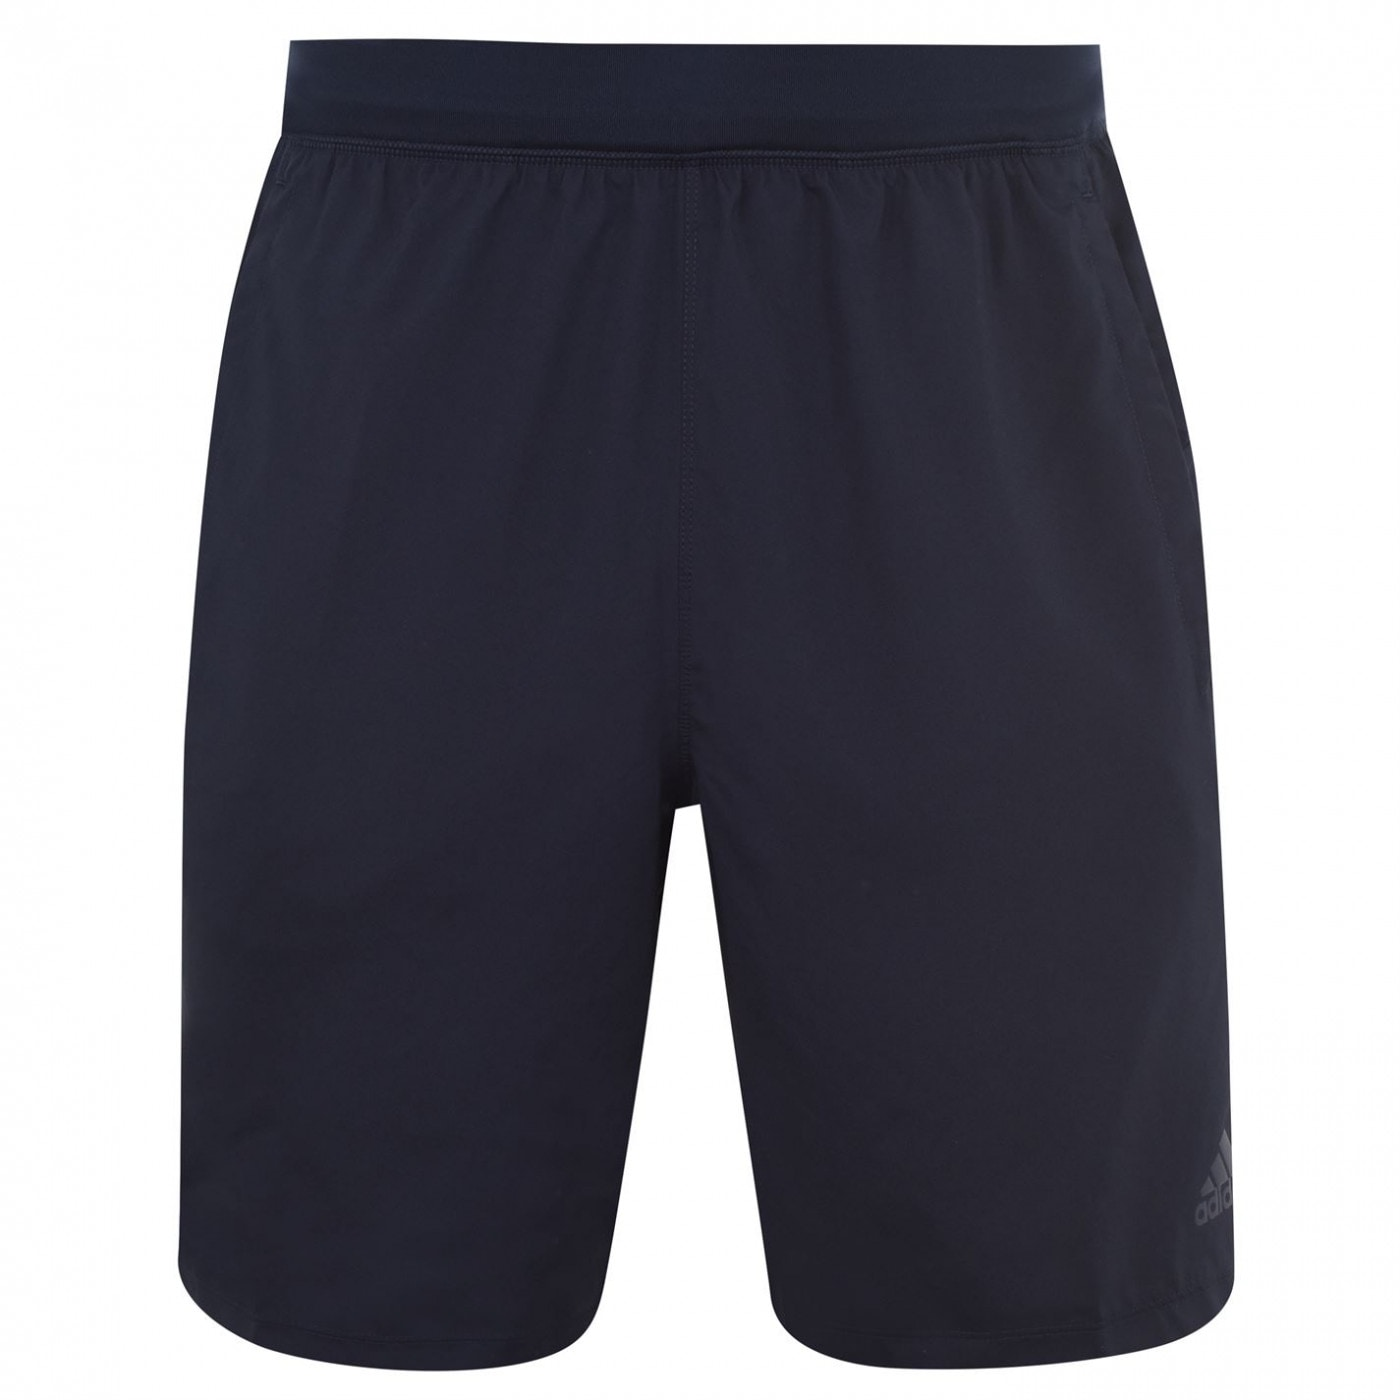 Adidas 4KRFT Tech Shorts Mens